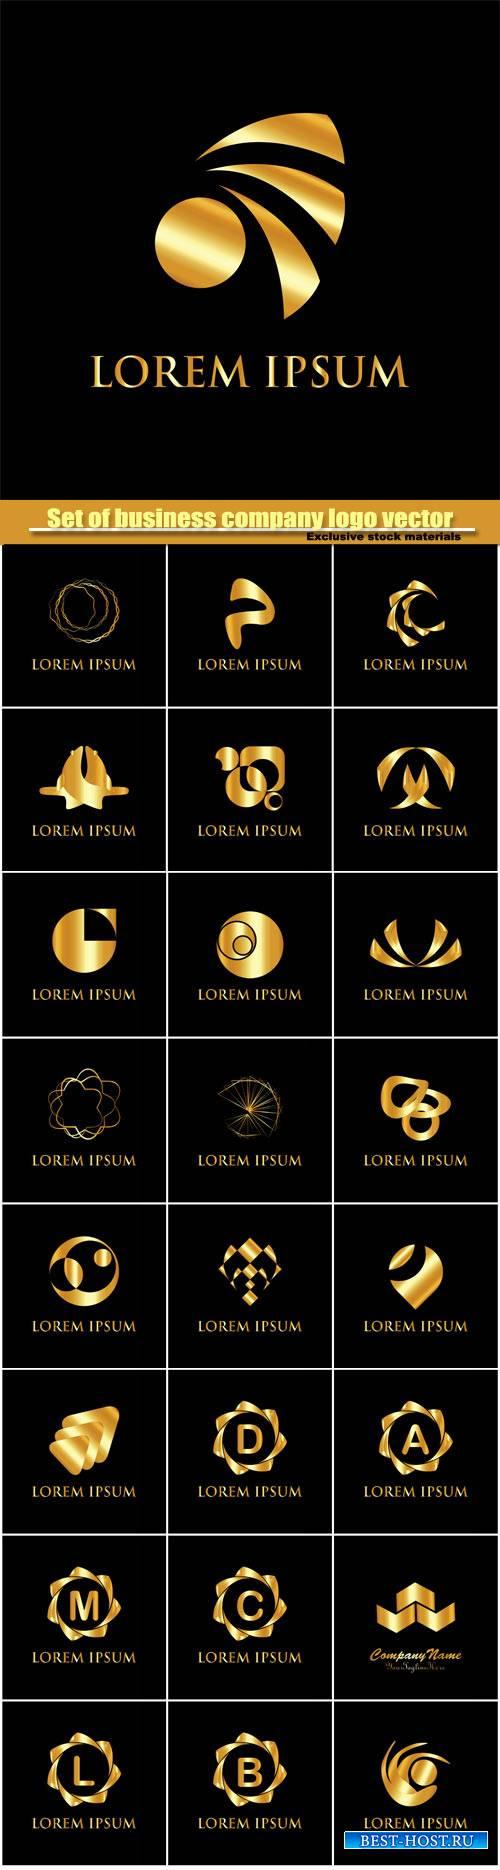 Set of golden business company logo vector